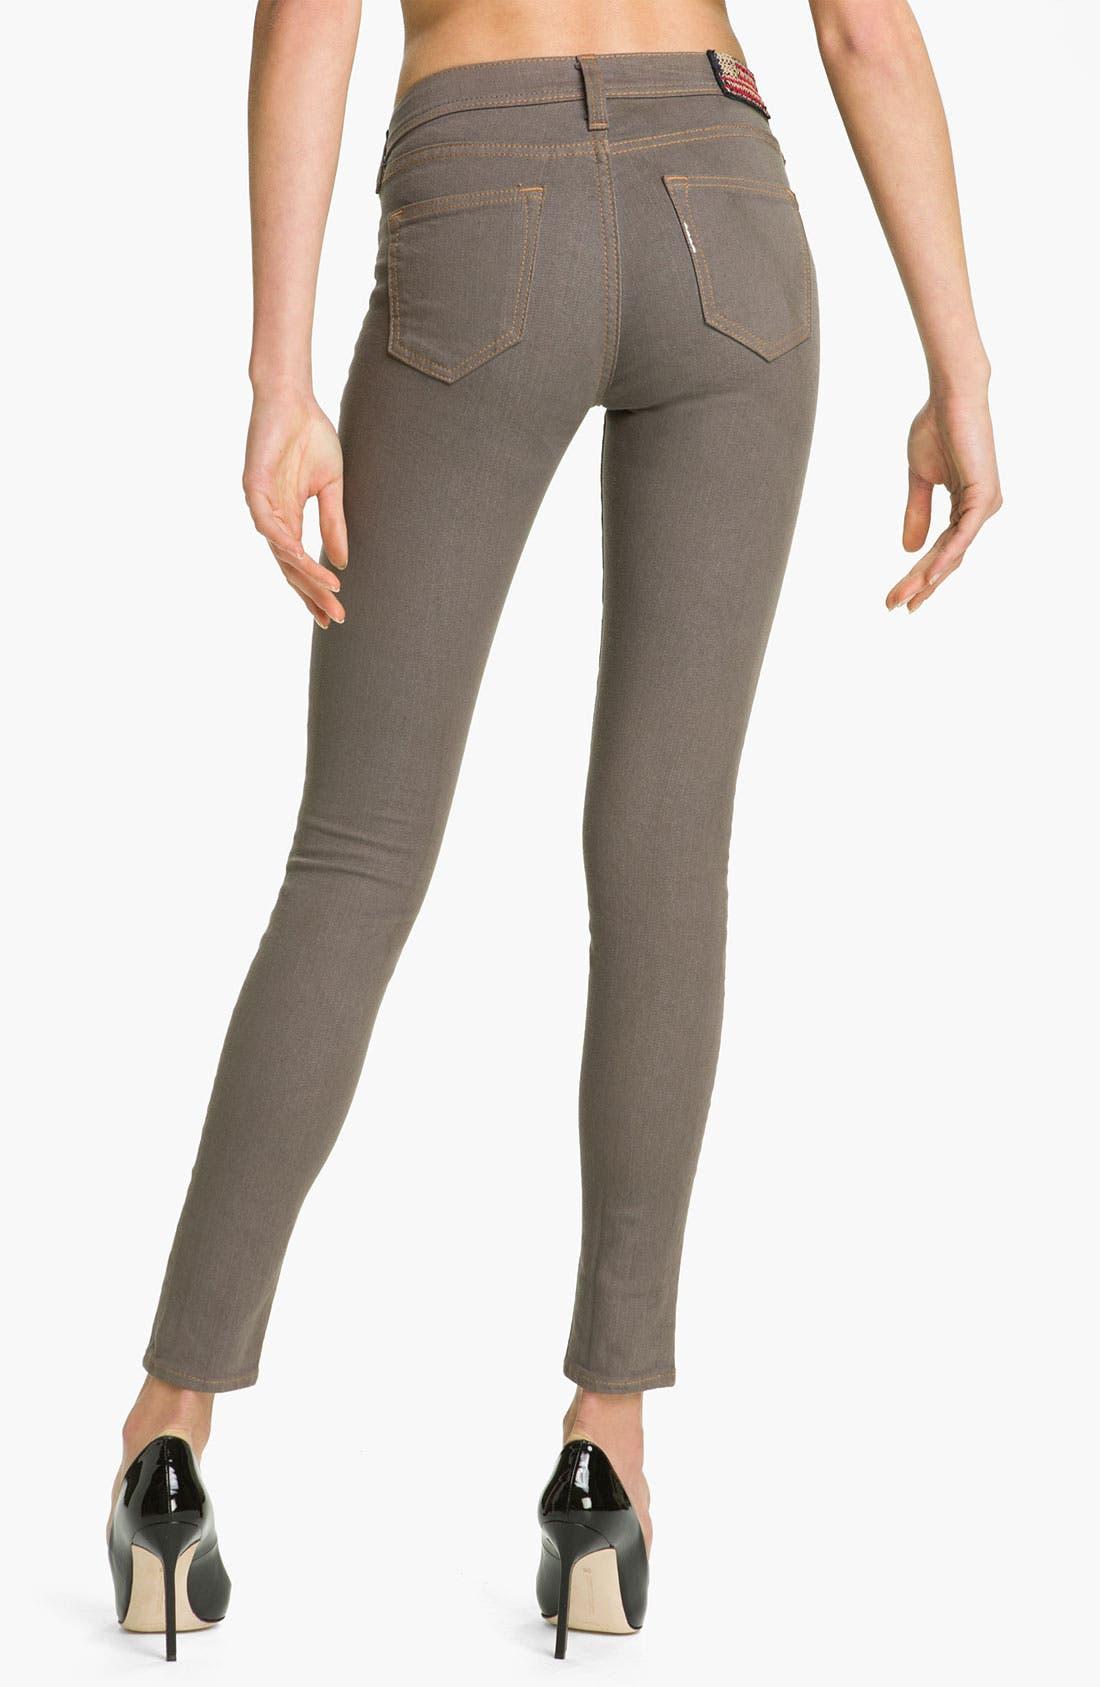 Alternate Image 2  - True Religion Brand Jeans 'Halle' Skinny Stretch Jeans (Dark Storm)